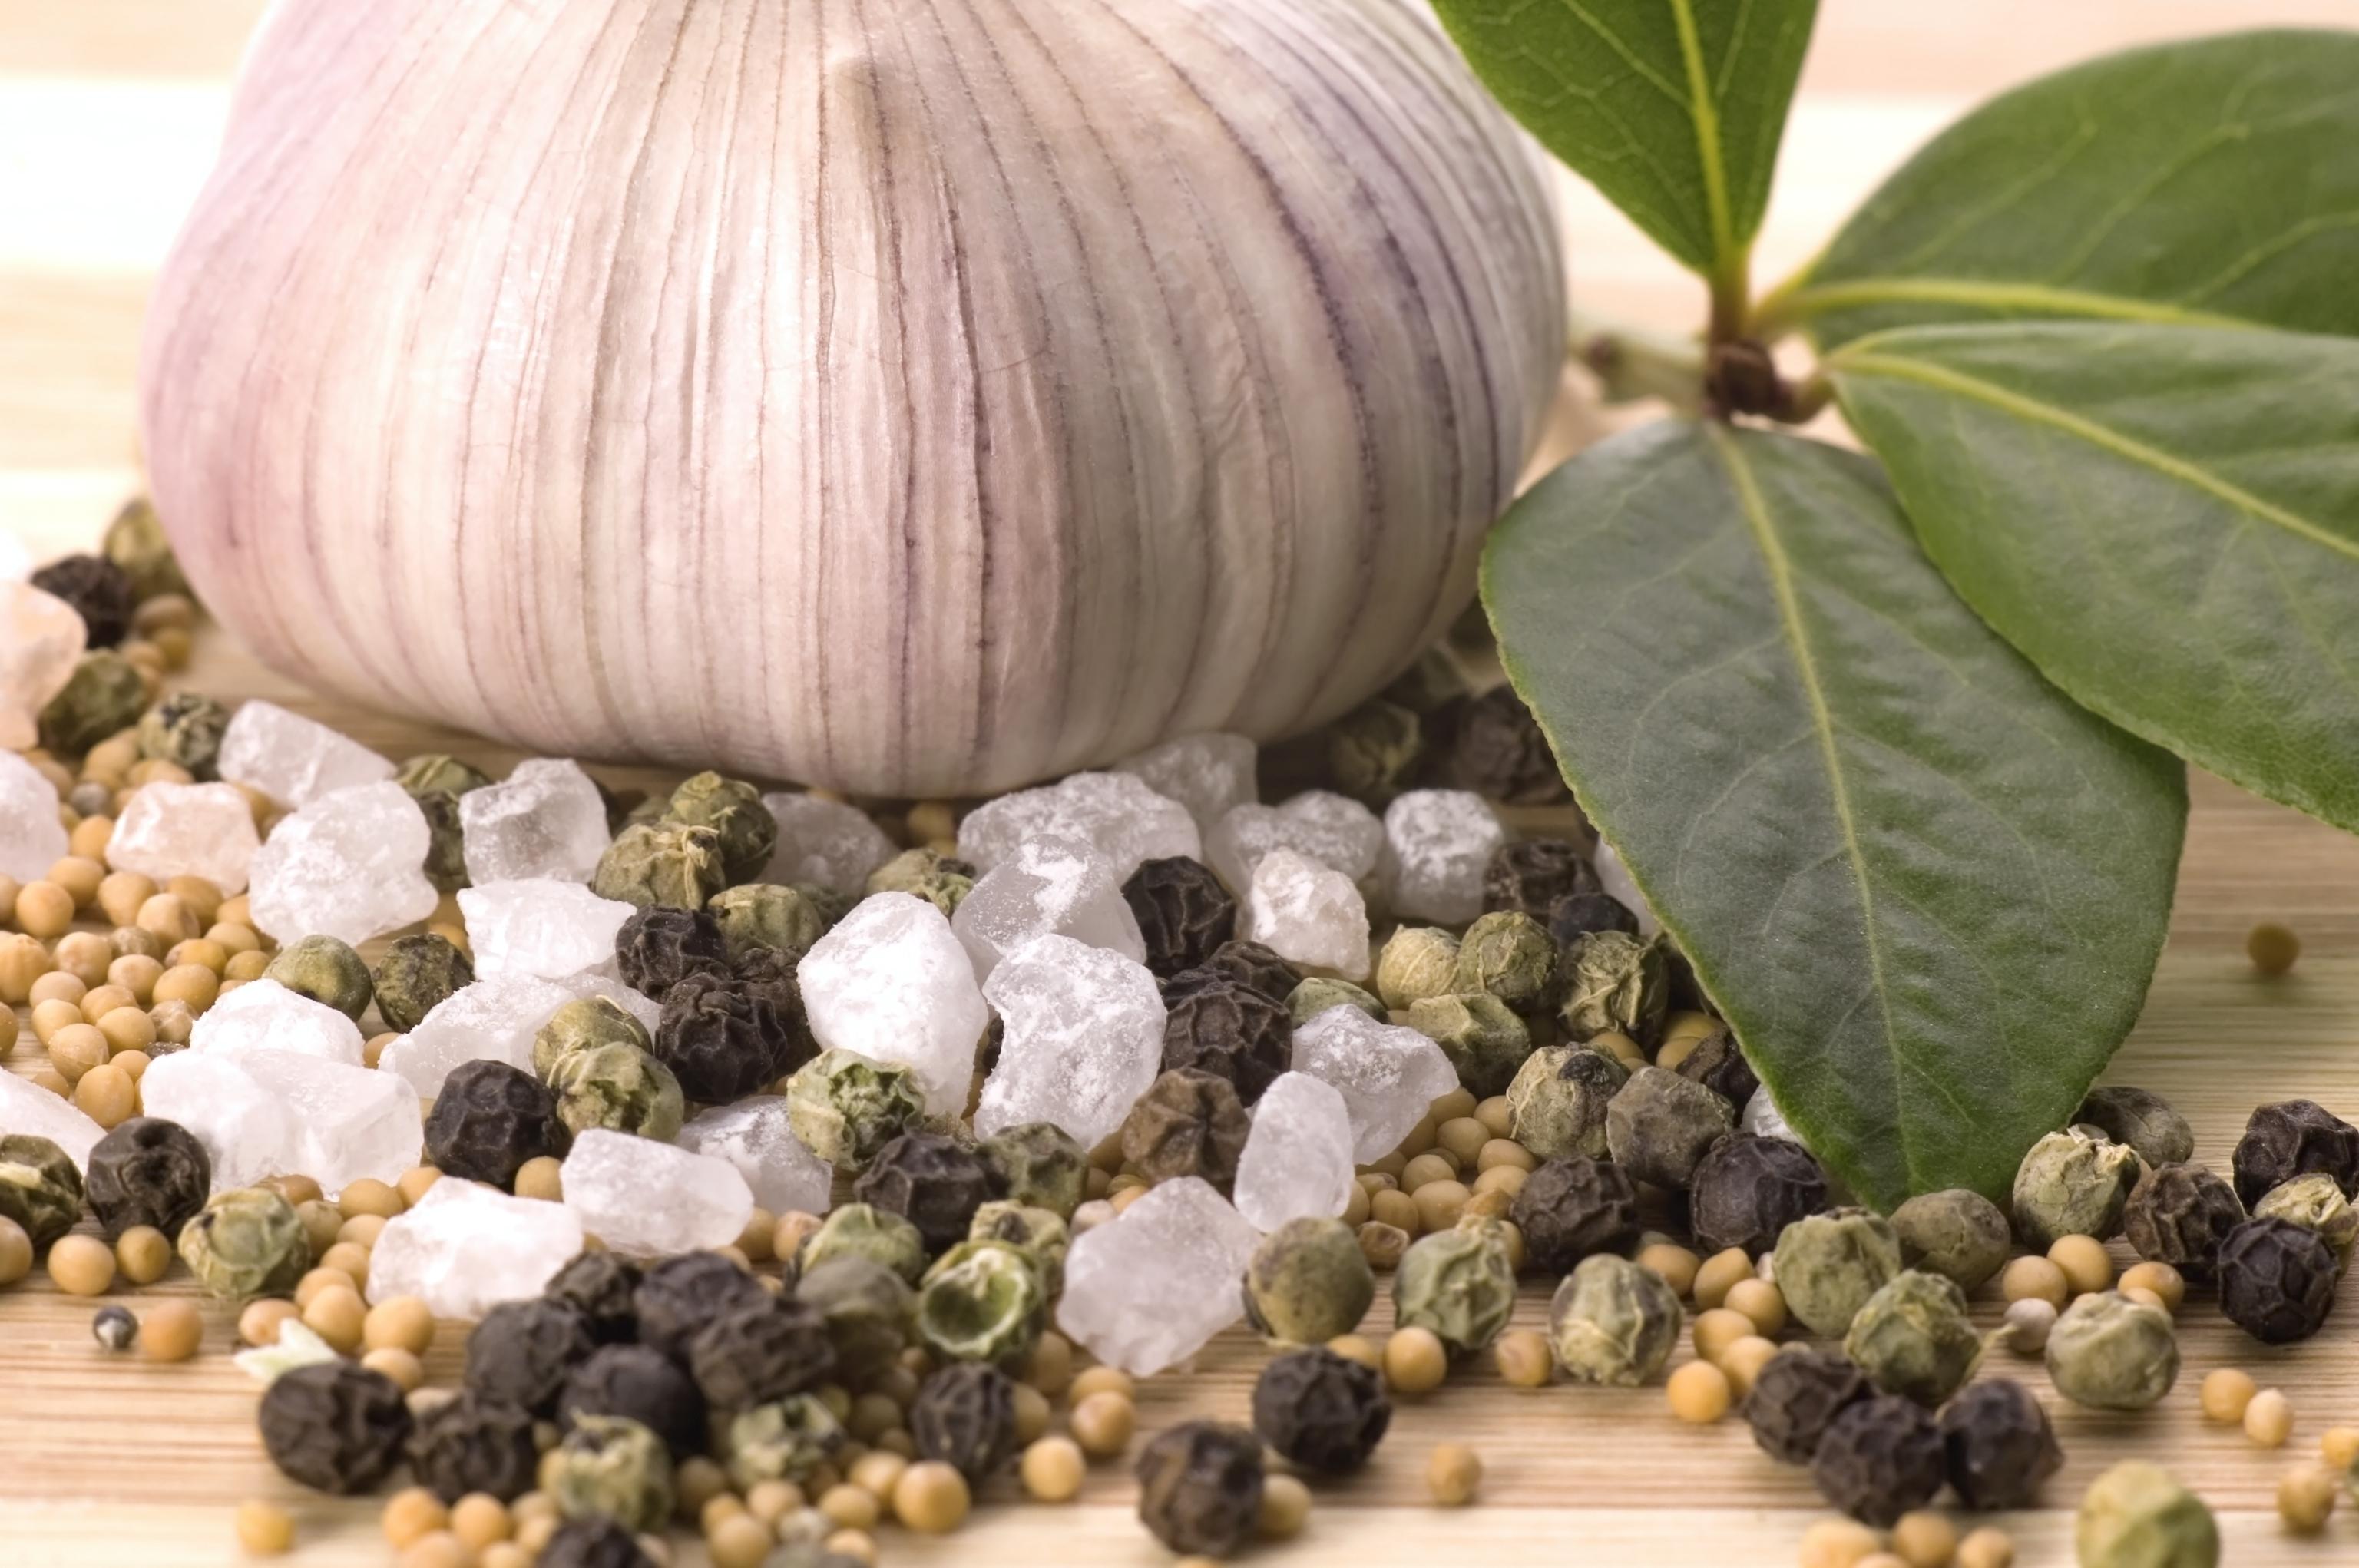 herbs and spices. garlic, rosematy, bay leaf, pepper, alt, nutmeg, vanilla, cardamon